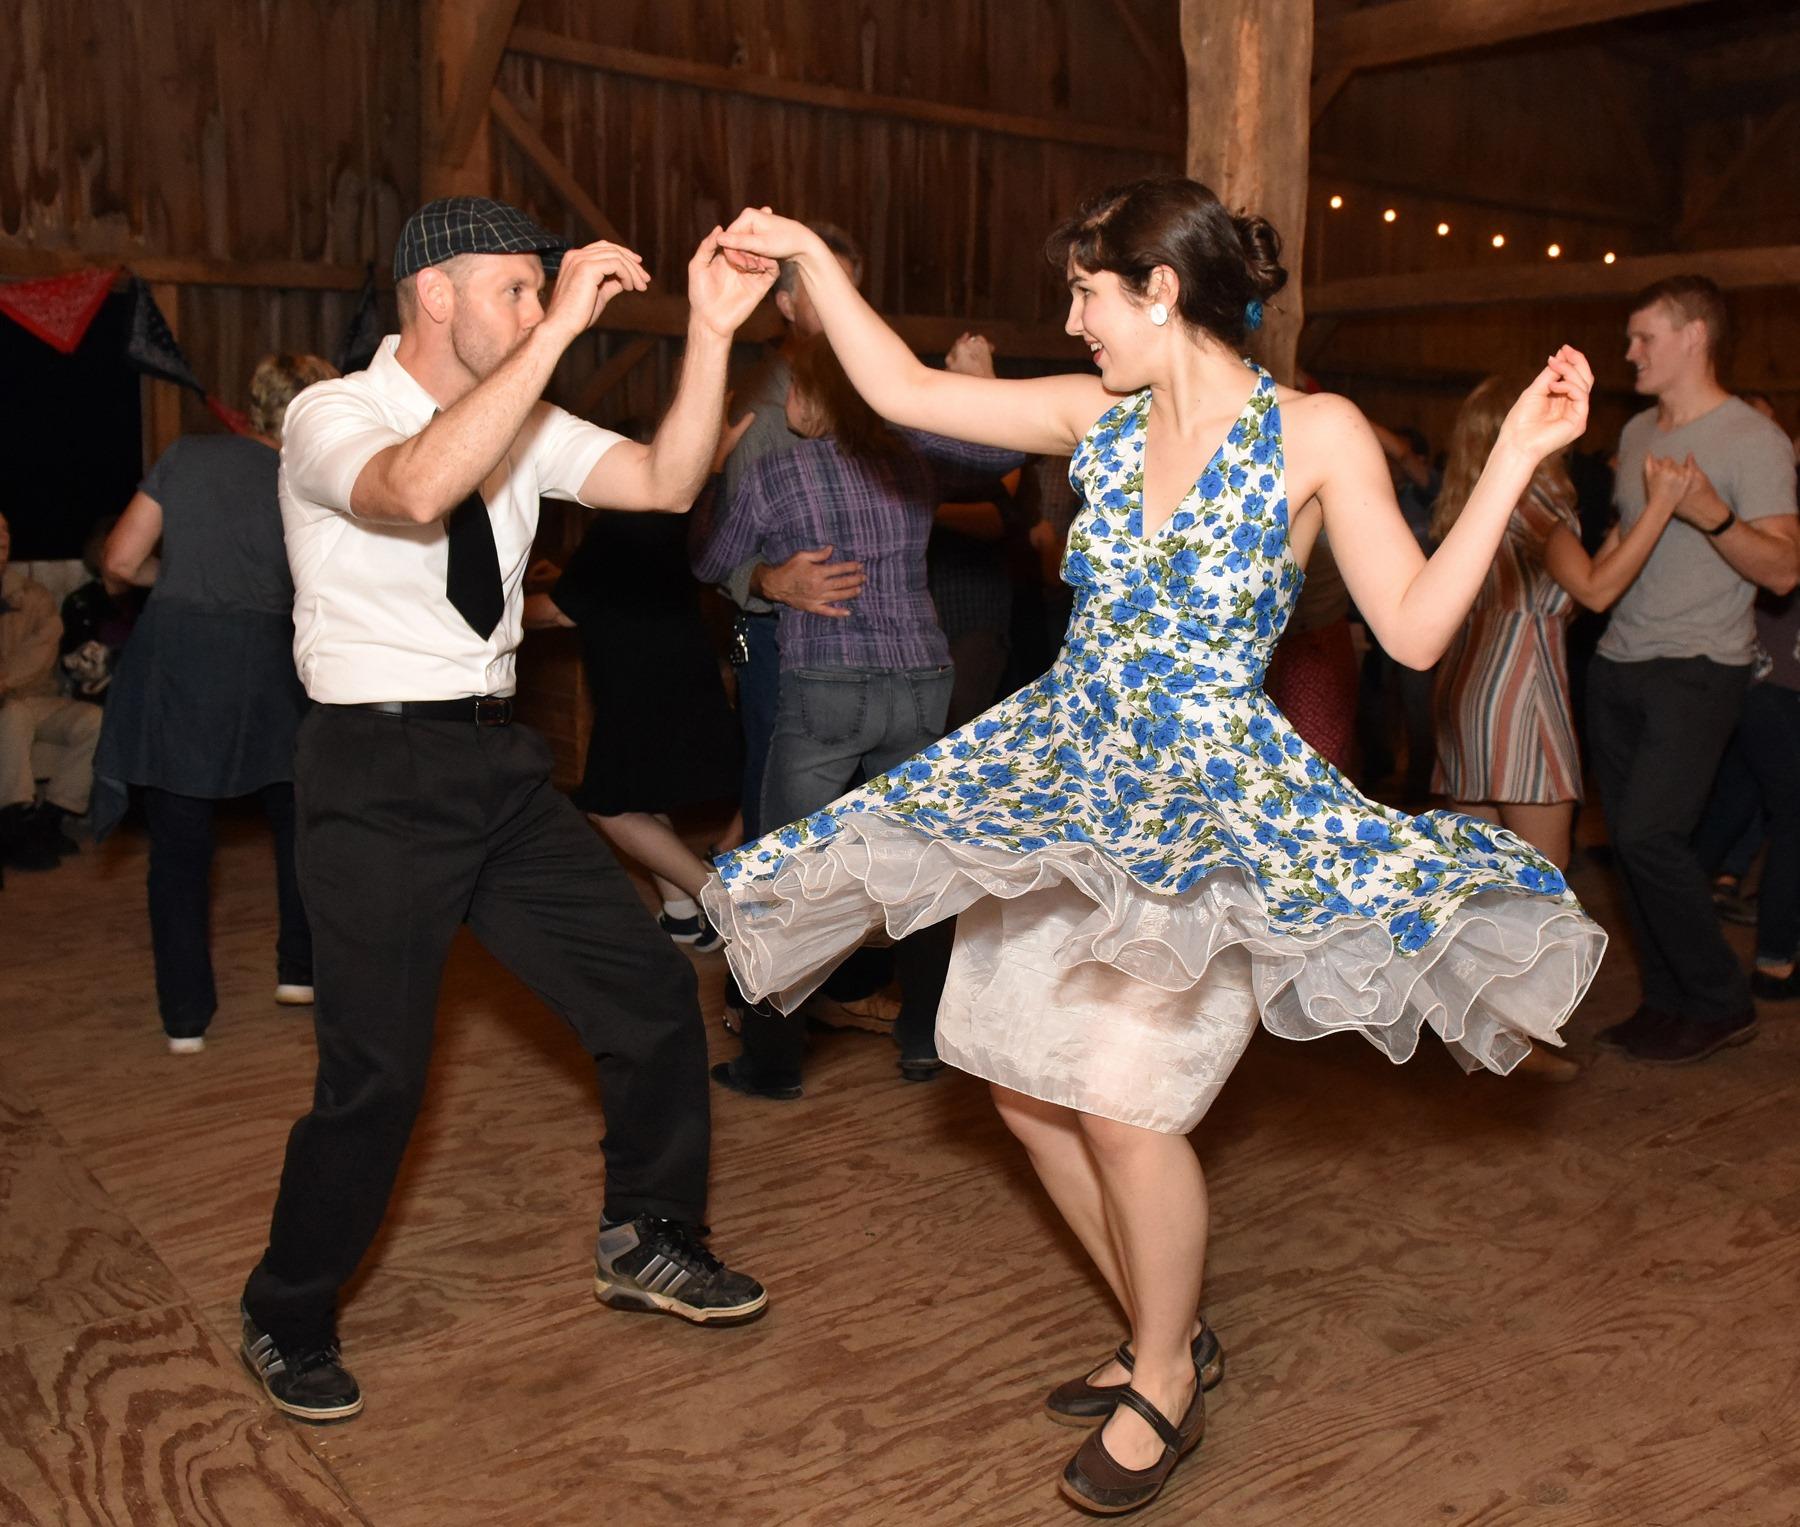 happy couple swing dancing wearing vintage clothing